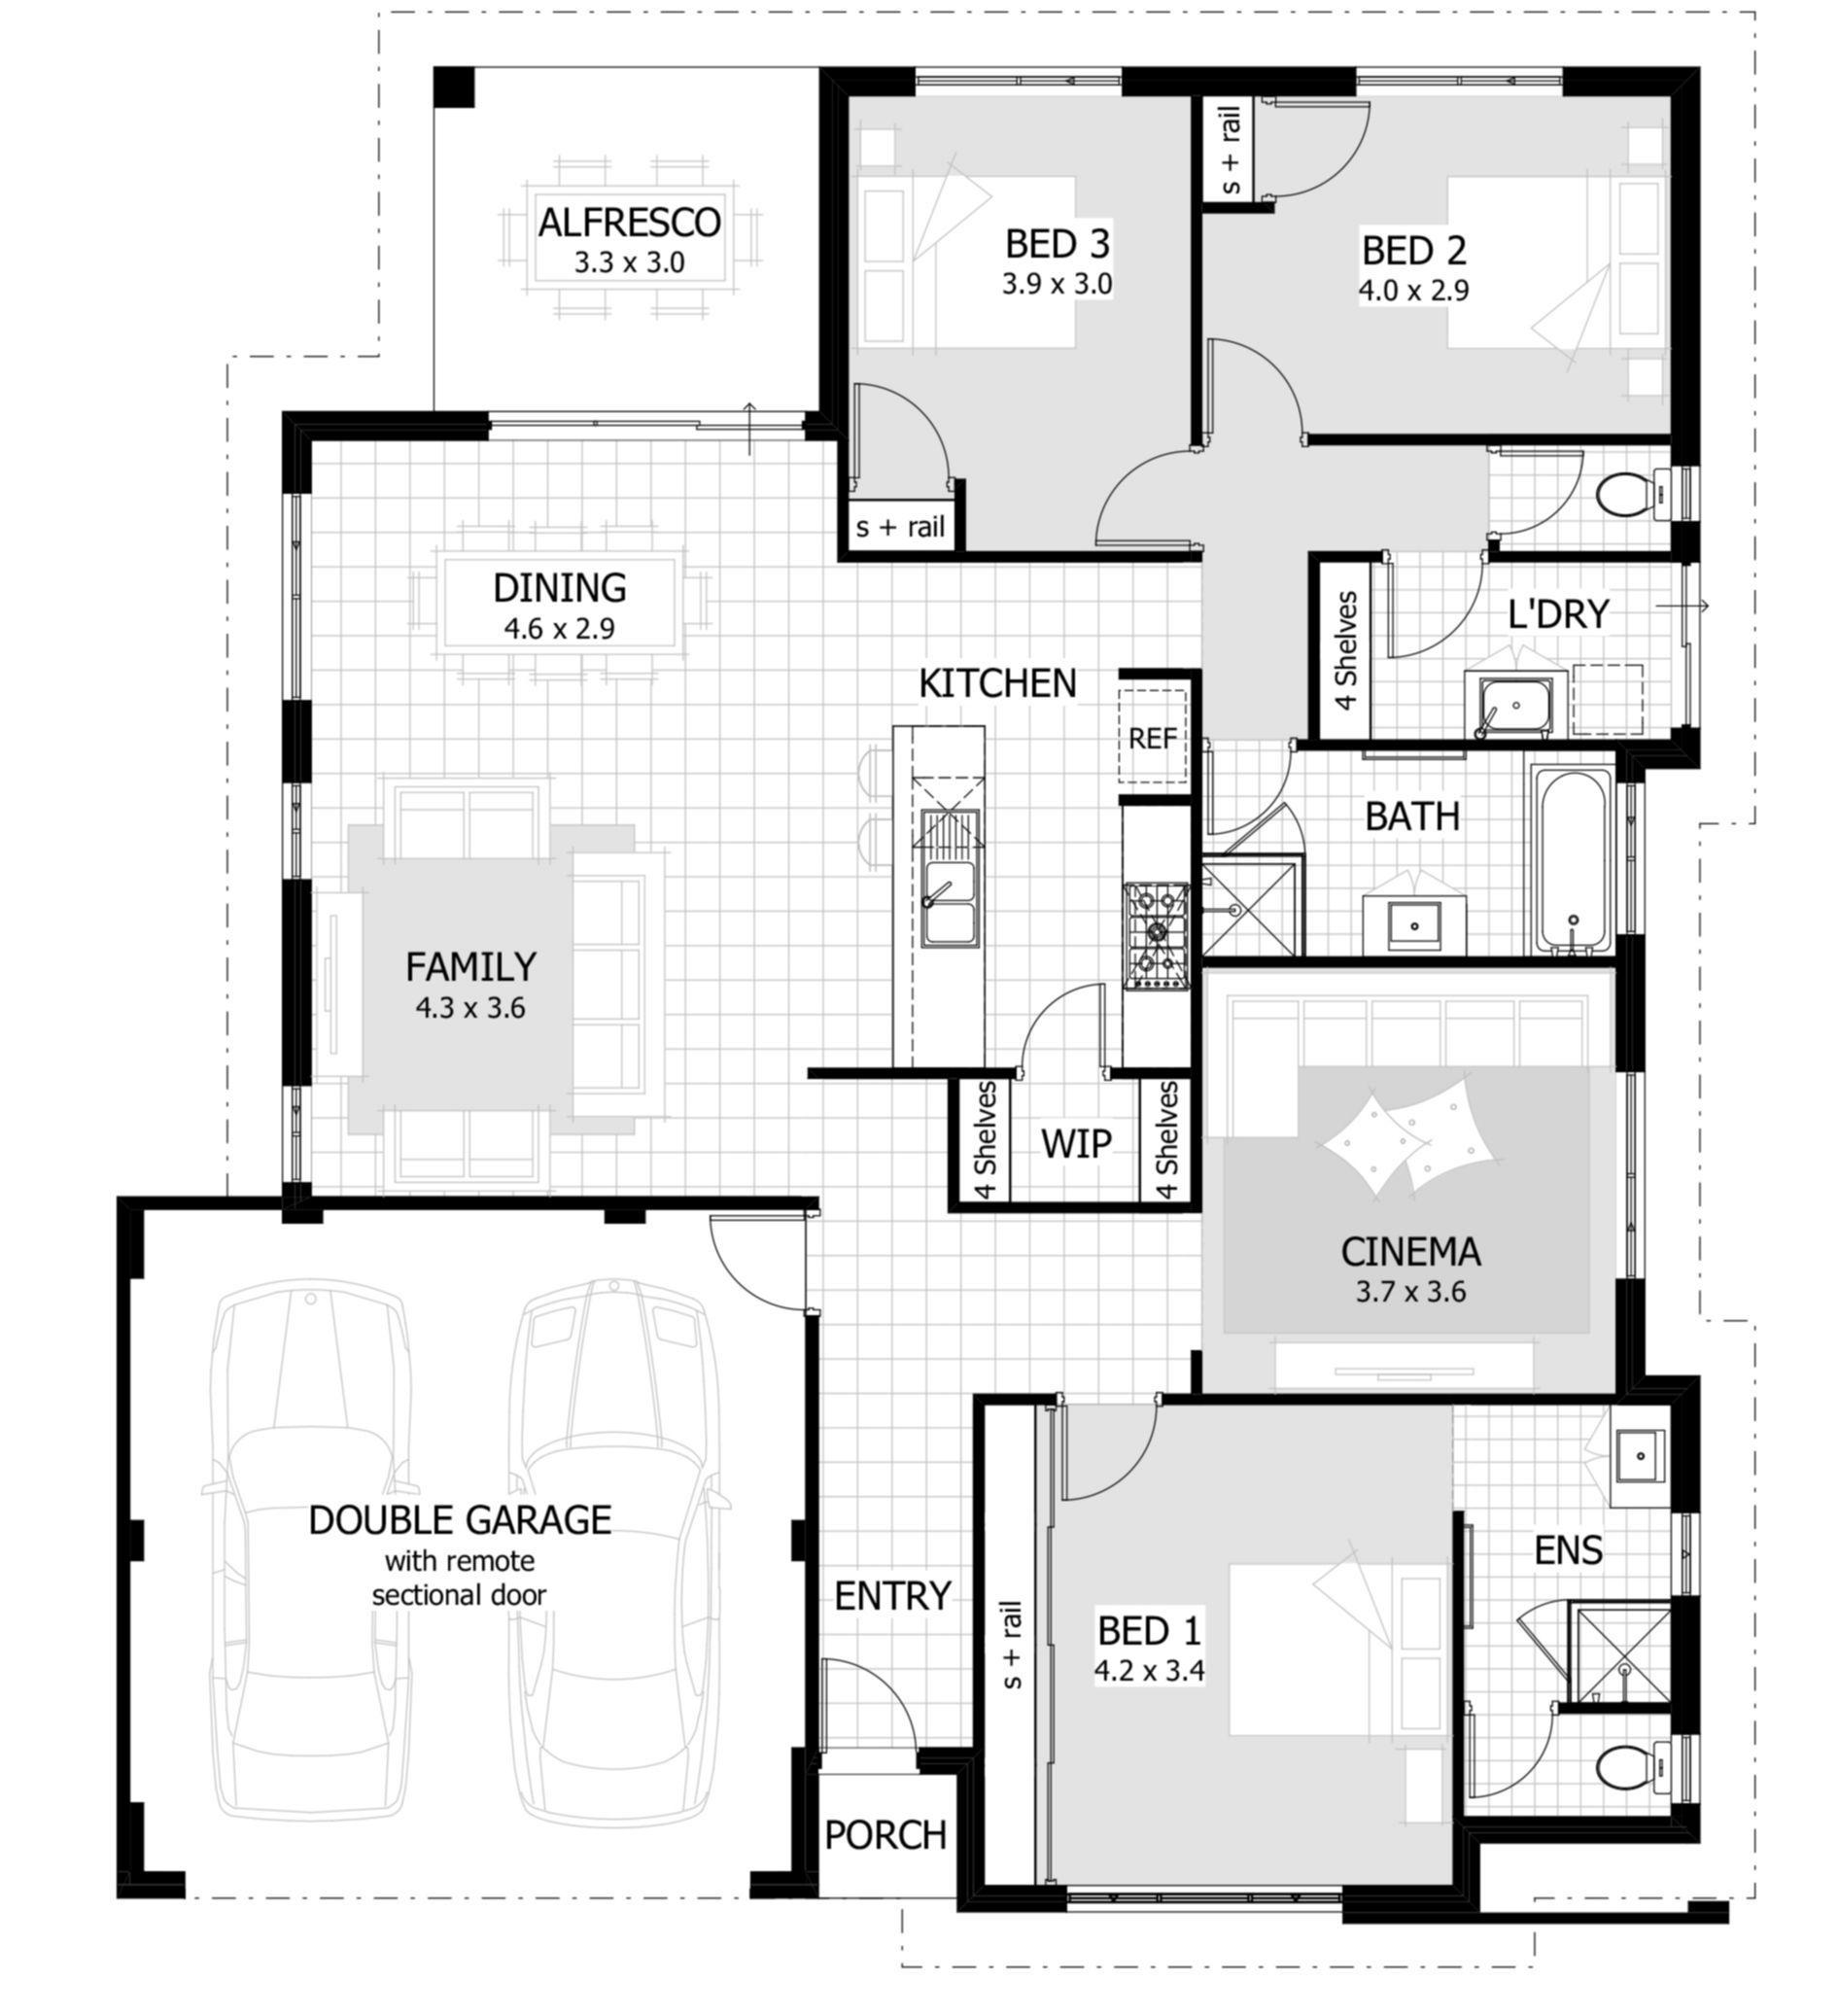 House Layout Sims Floor Plans 22 Trendy Ideas House Renovation Plans My House Plans House Layouts